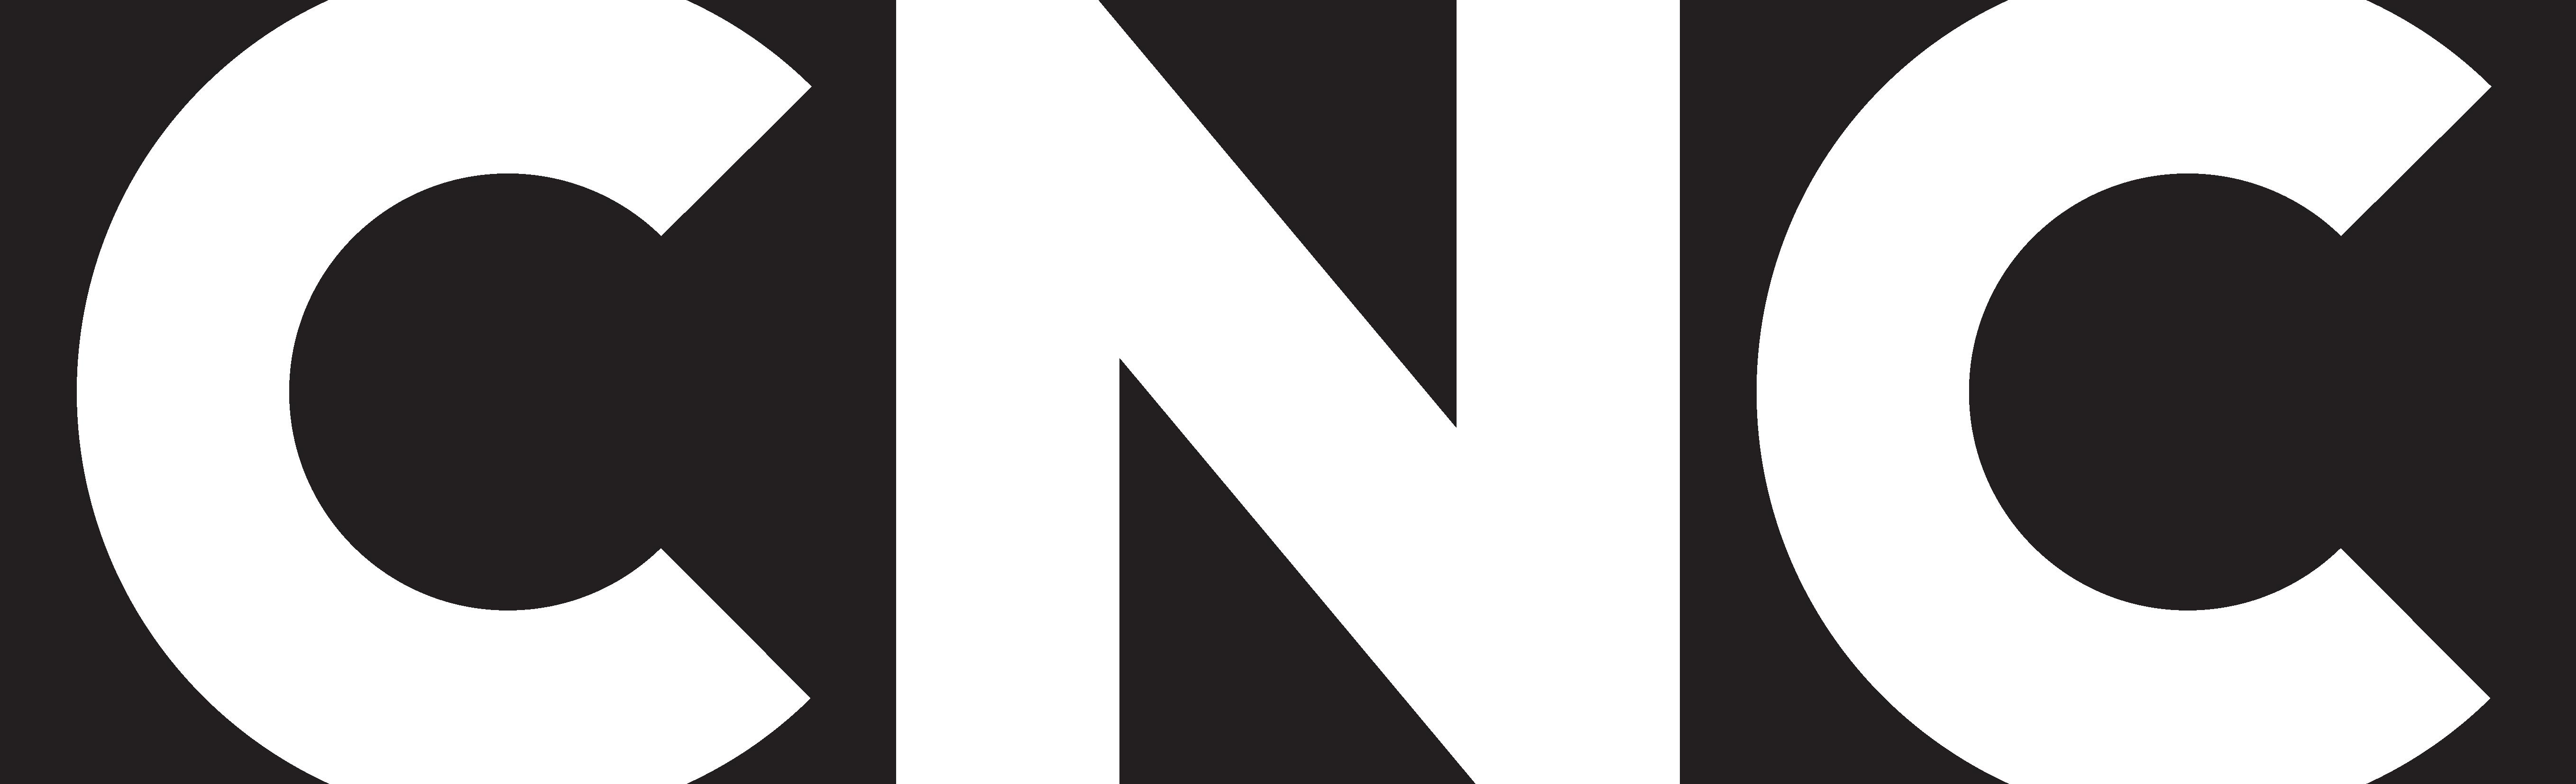 organization-logotype